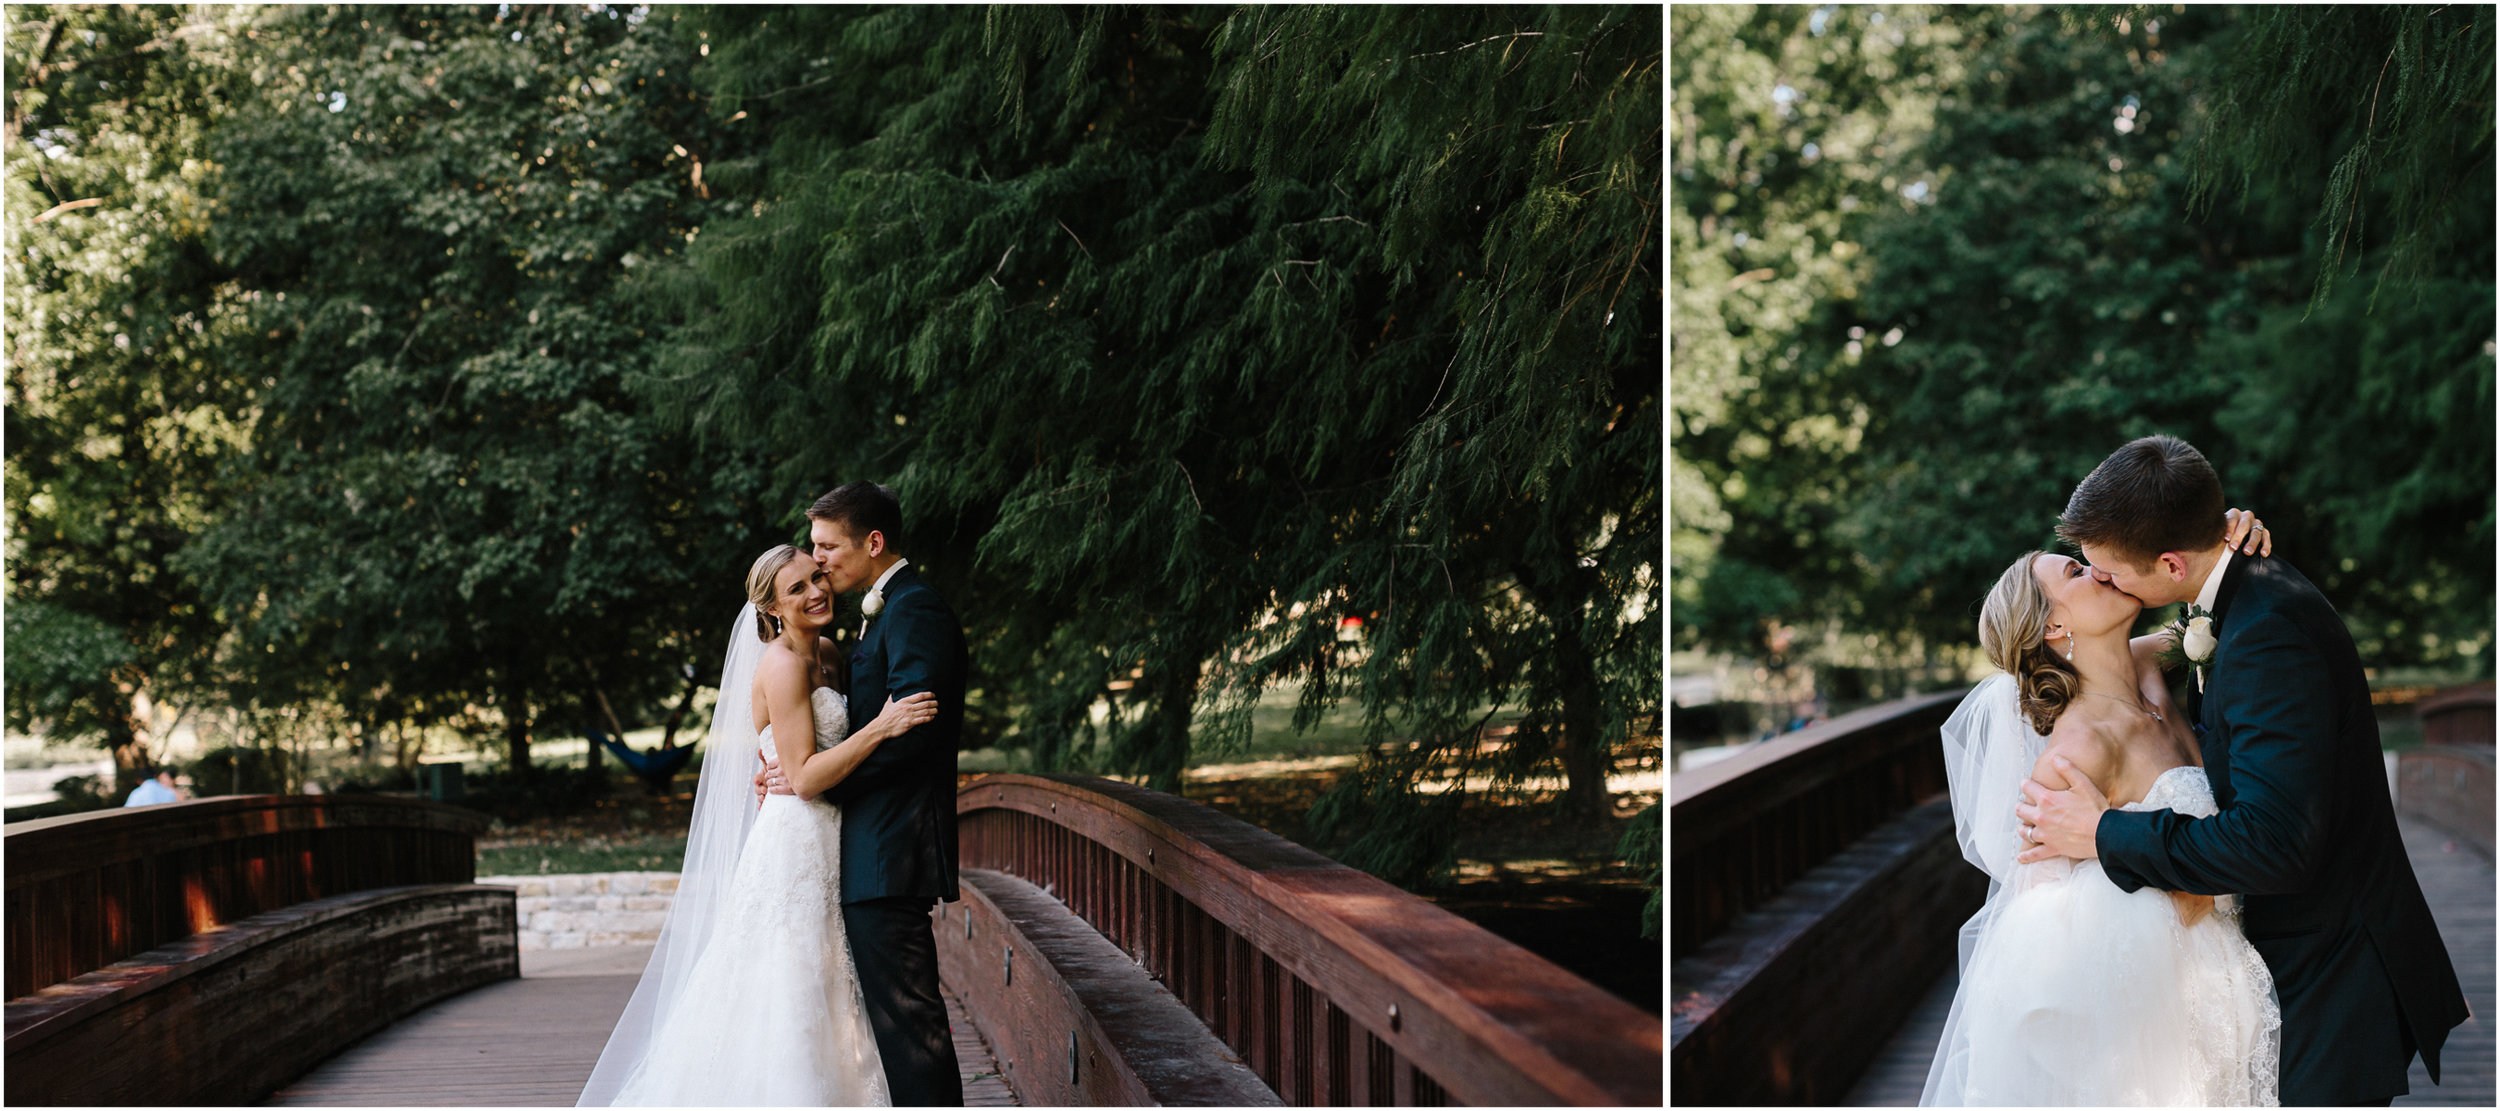 alyssa barletter photography kansas city wedding photographer katie and kendall-41.jpg